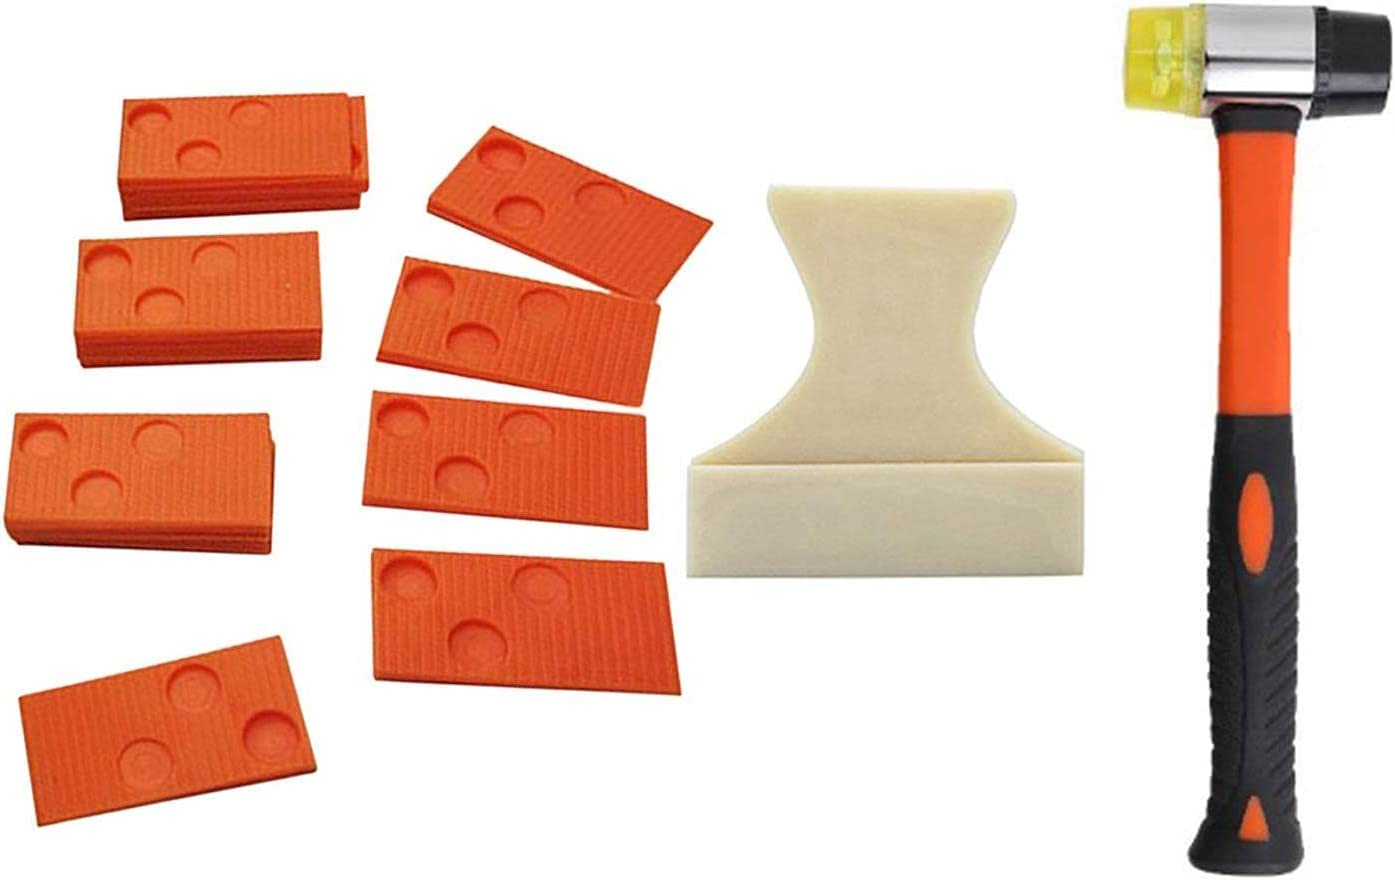 Large special price oftenrain Luxury Laminate Max 47% OFF Wood Kit,wi Flooring Installation